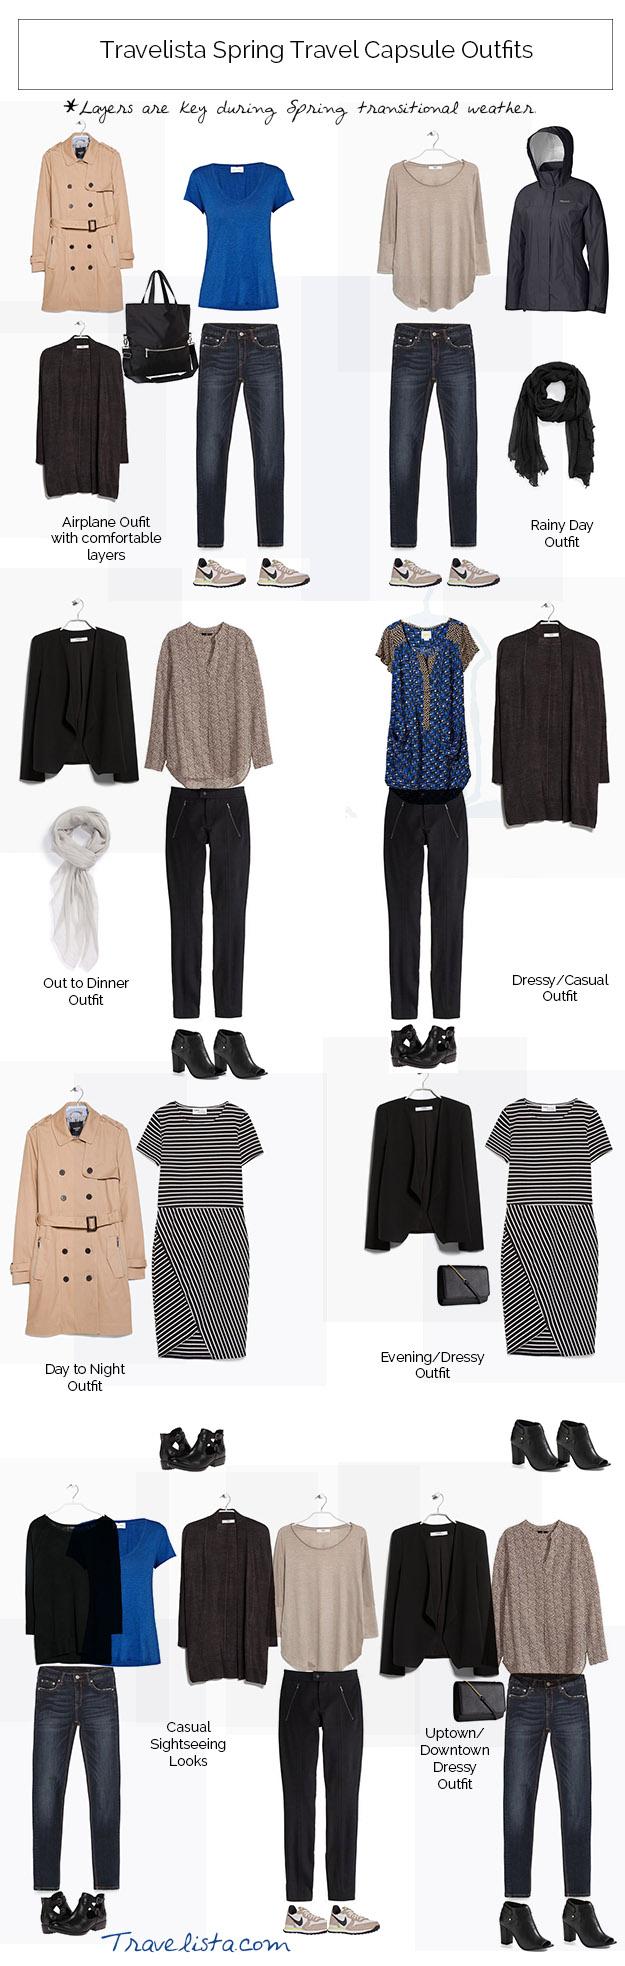 trav_spring_outfits copy